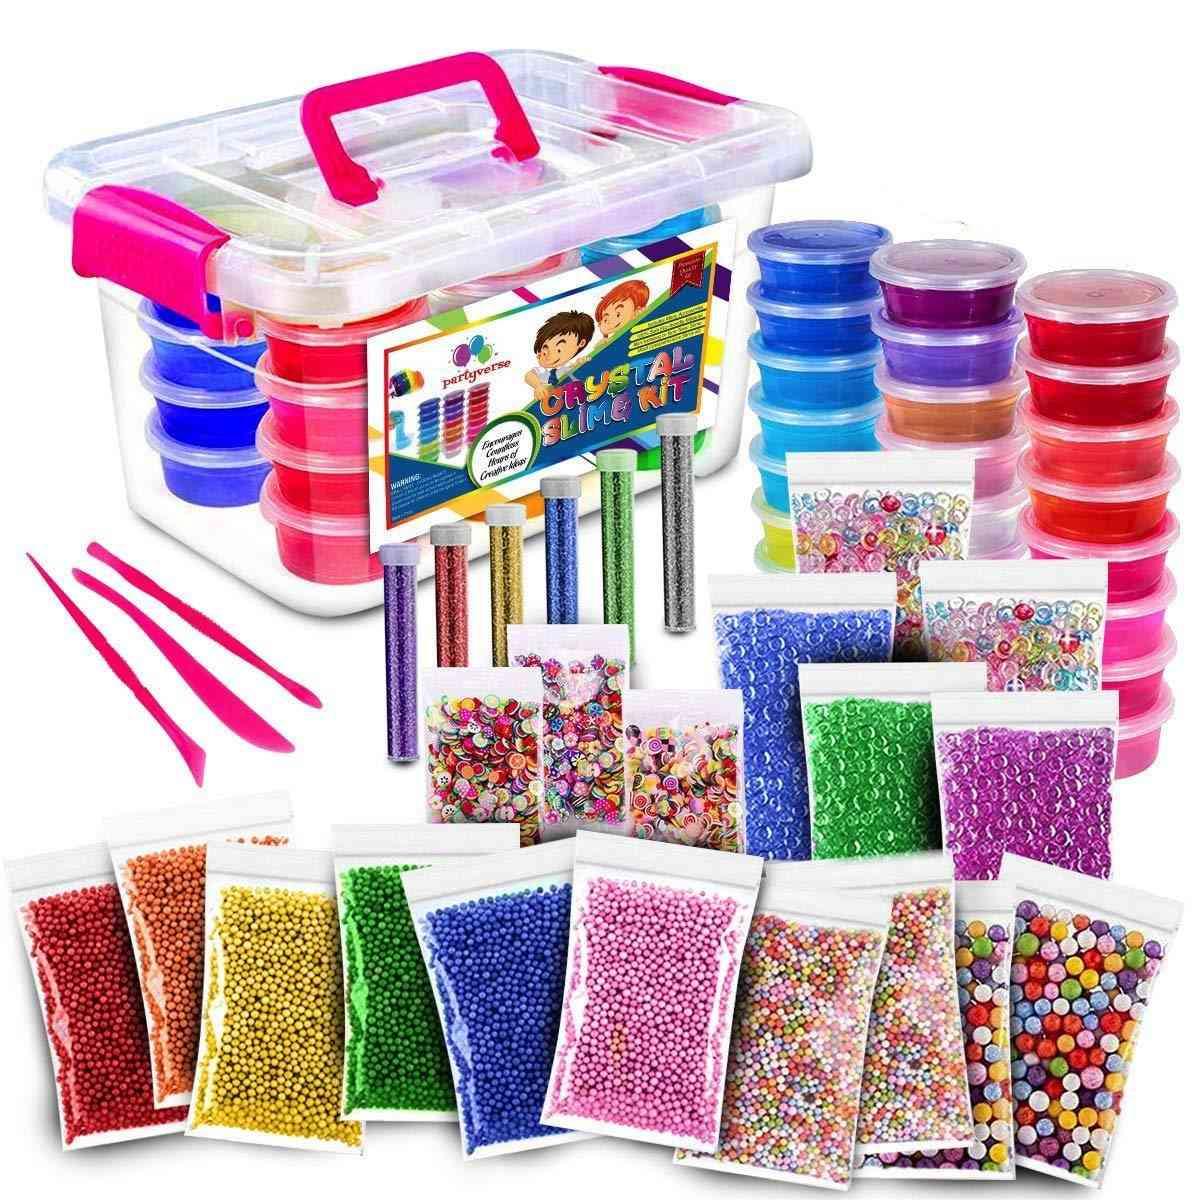 Fluffy Slime Kit 24 Color Slime Supplies For Kids Diy Kit